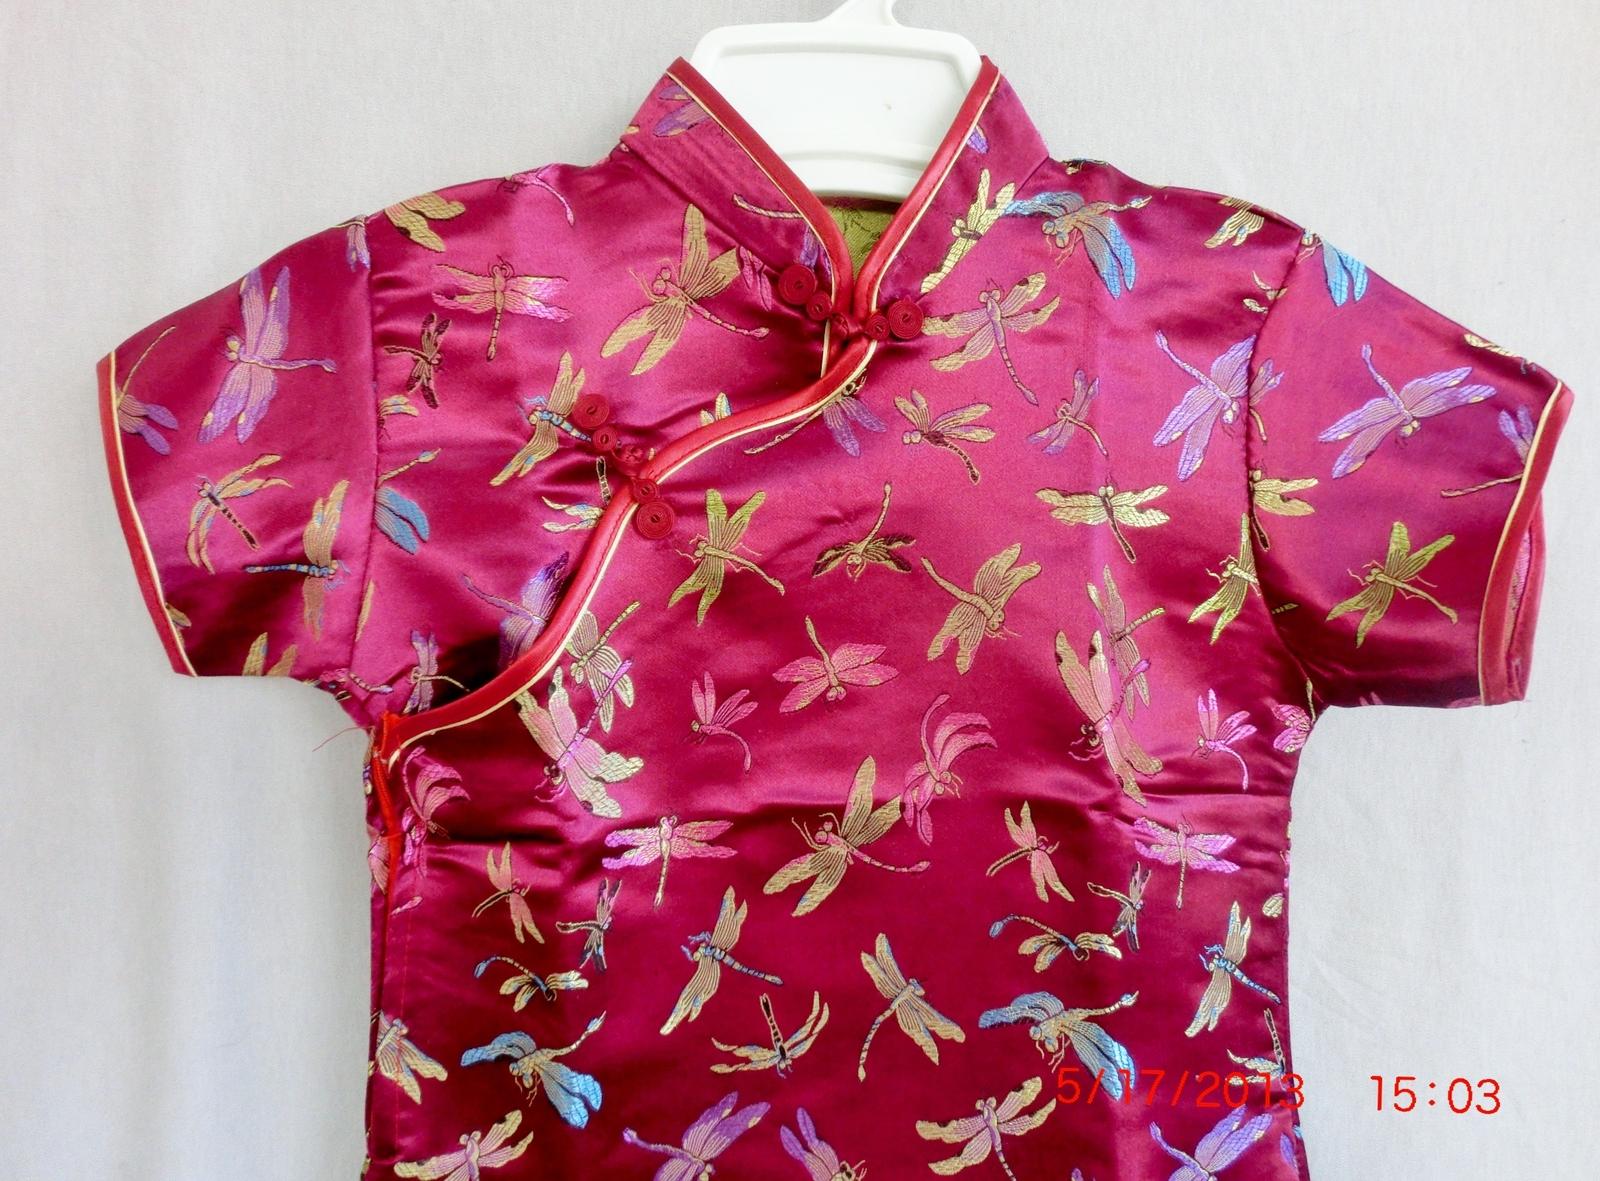 Chinese silk satin rose pink gold color dragonflies girls cheong-sam-dress sz 12